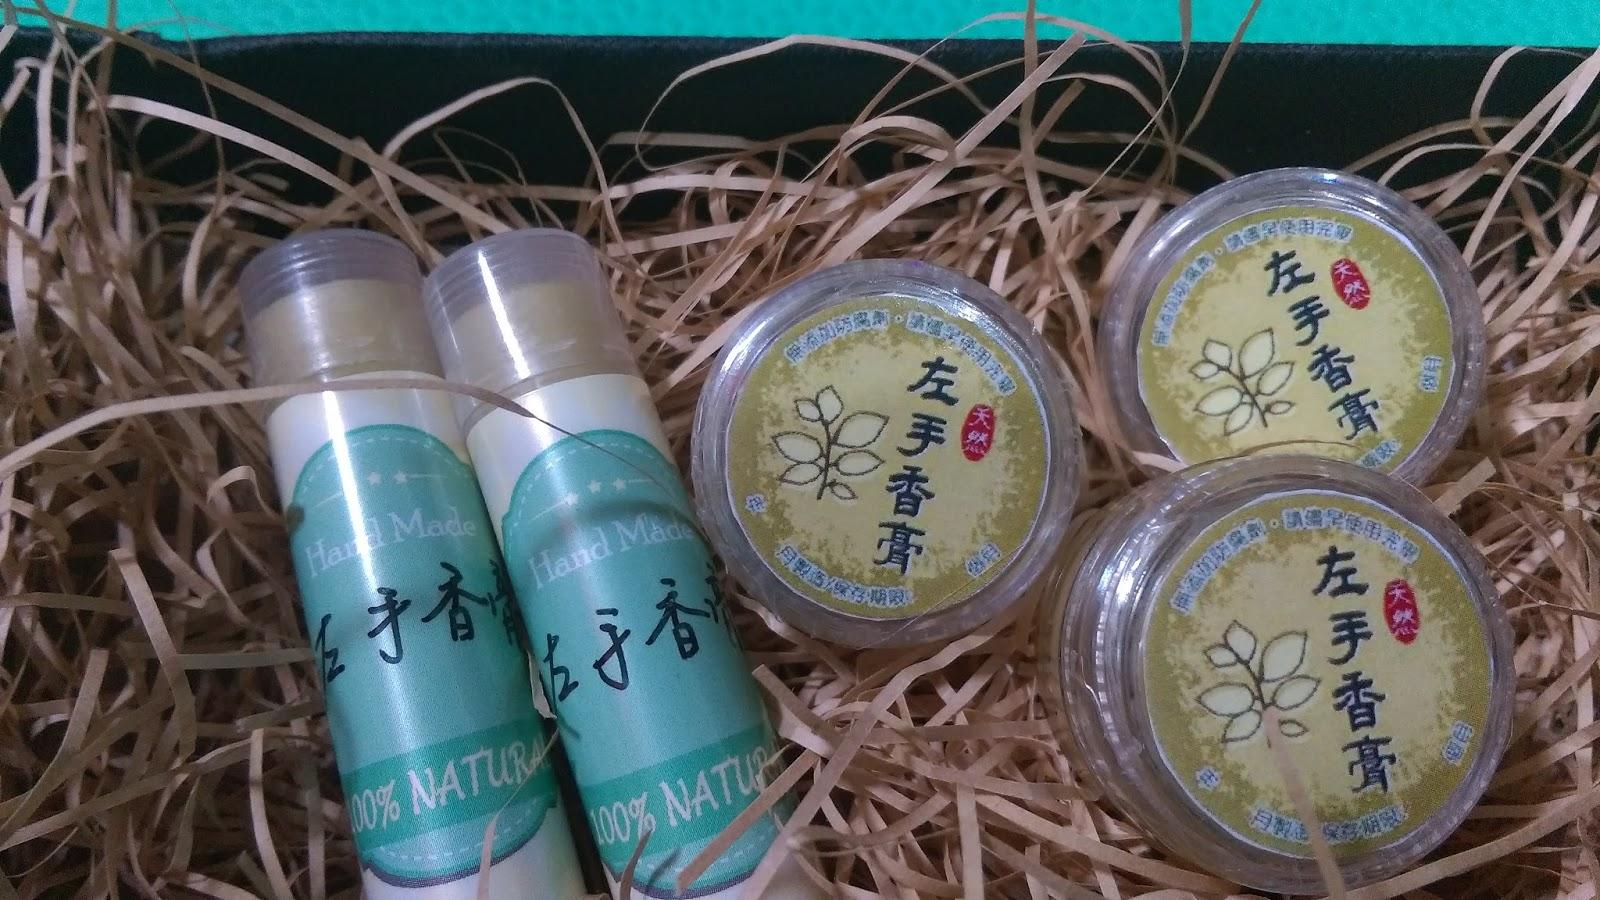 sheila's handmade shop: 左手香膏